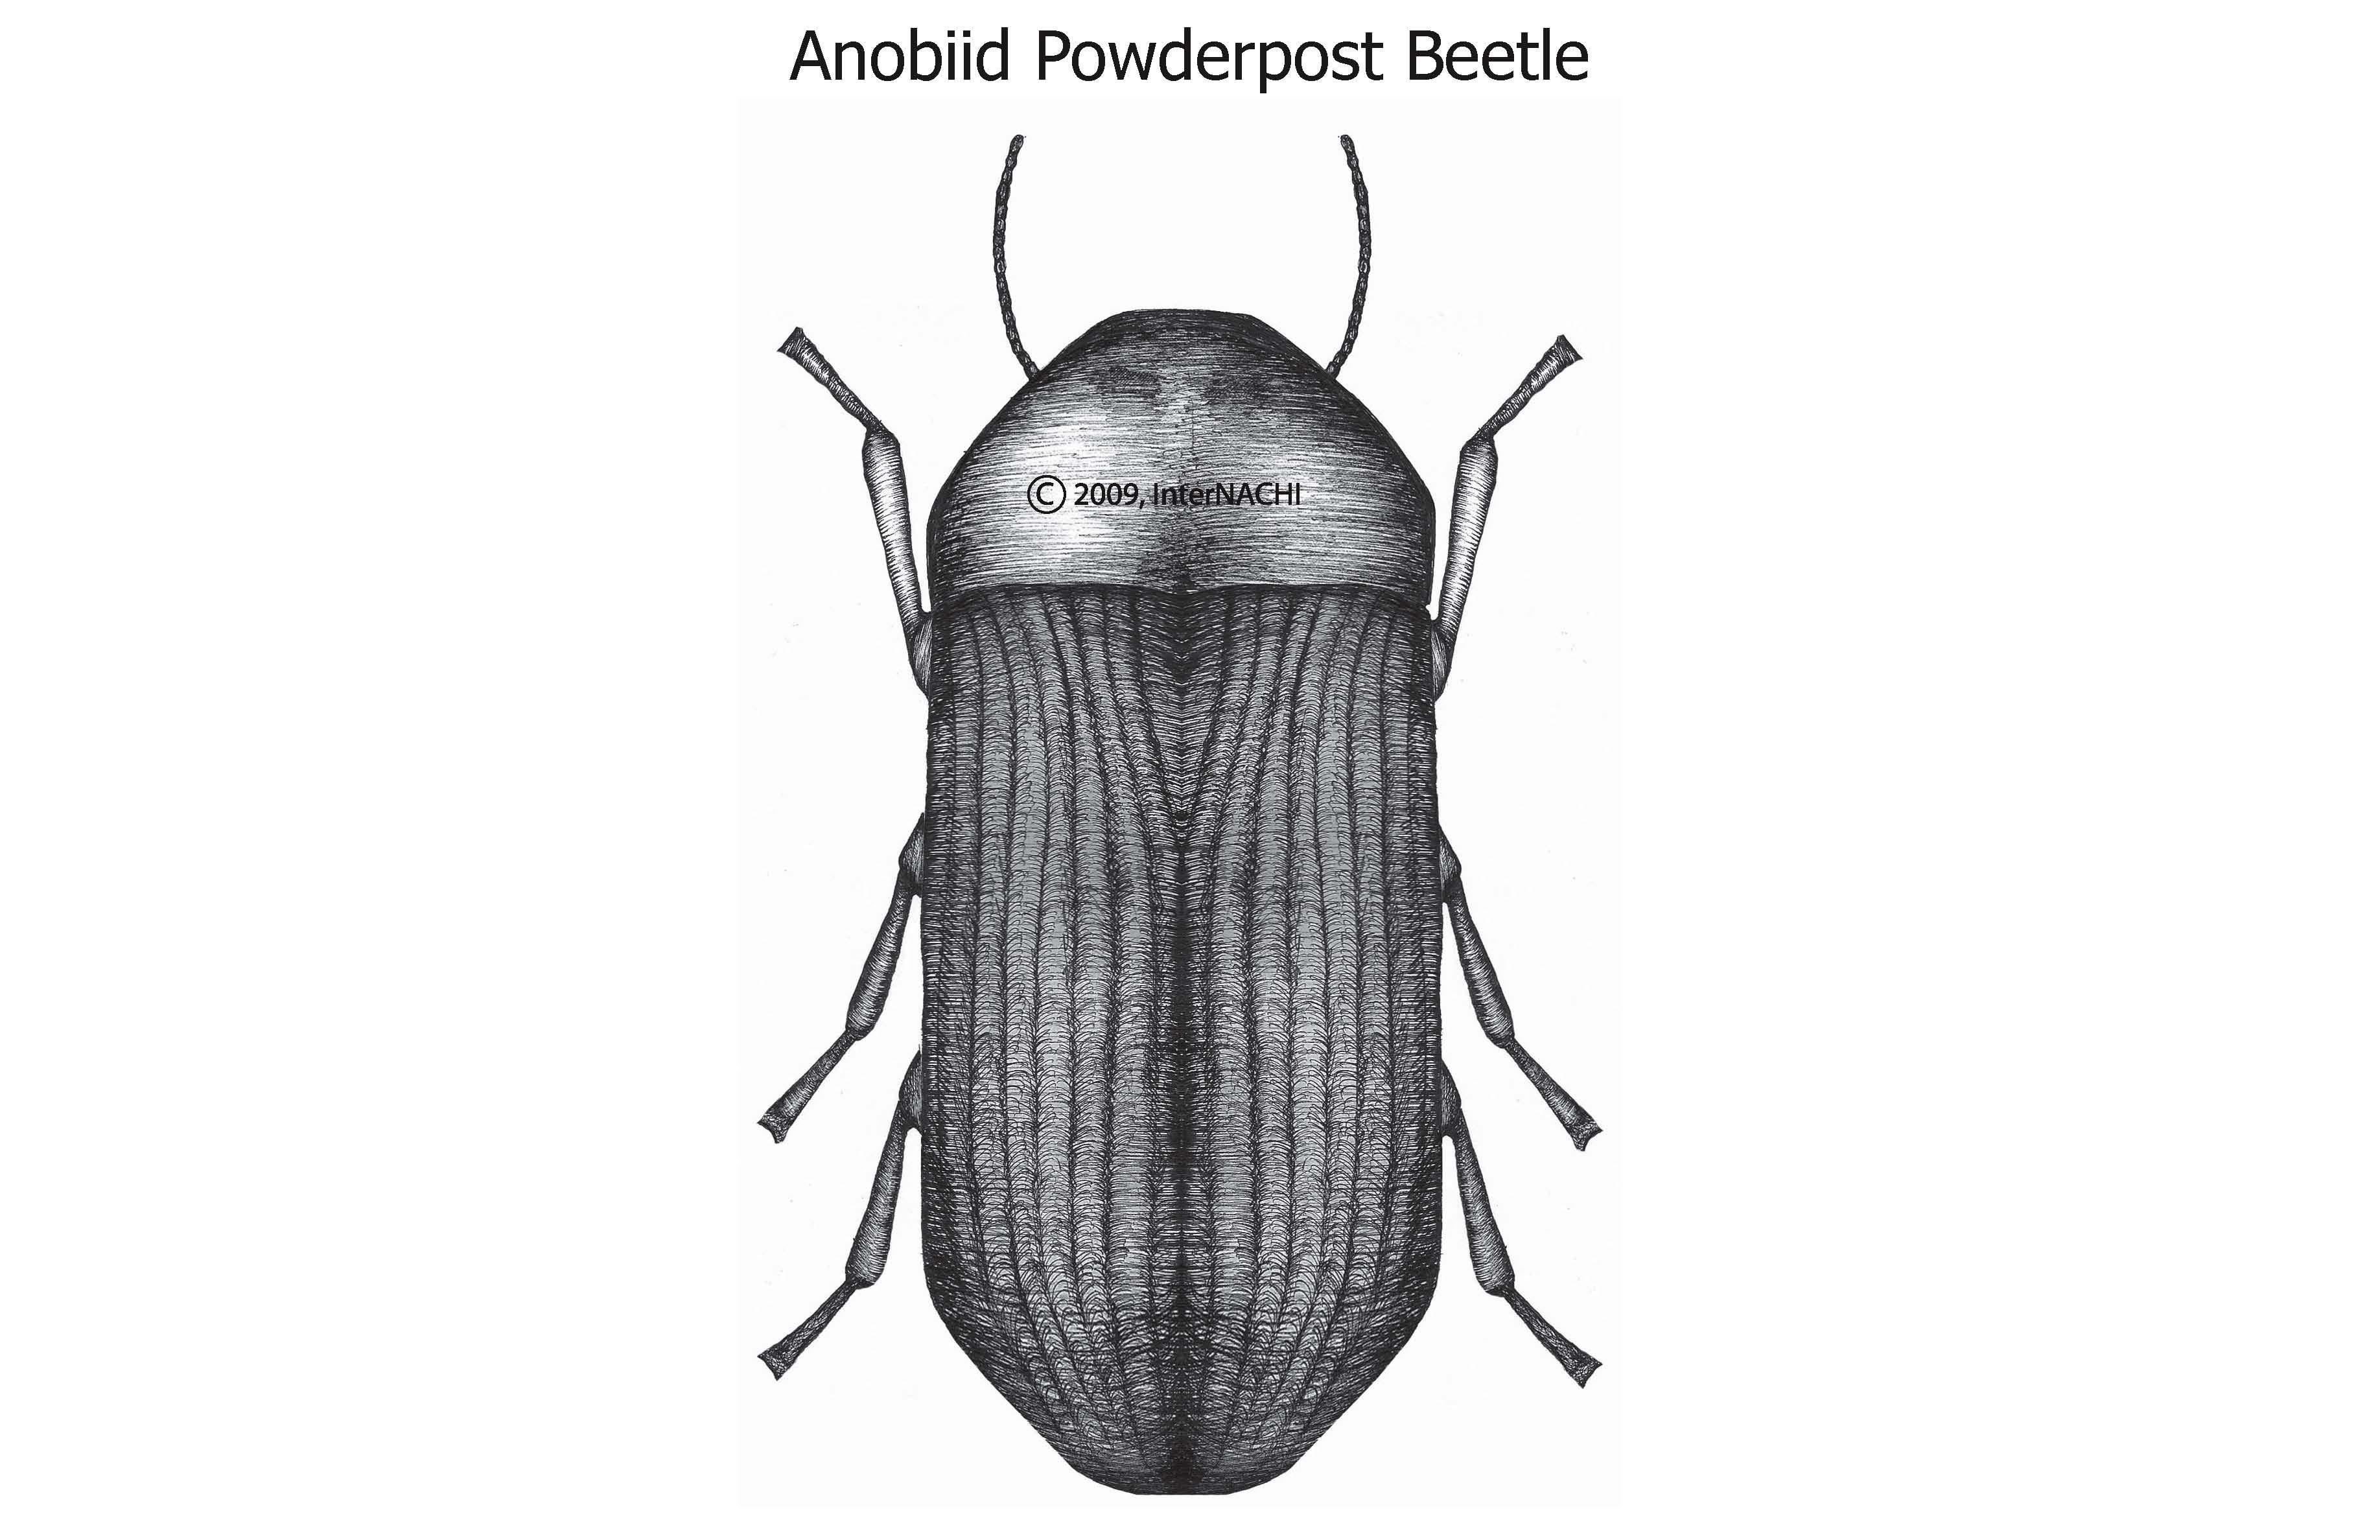 Anobiid powderpost beetle.